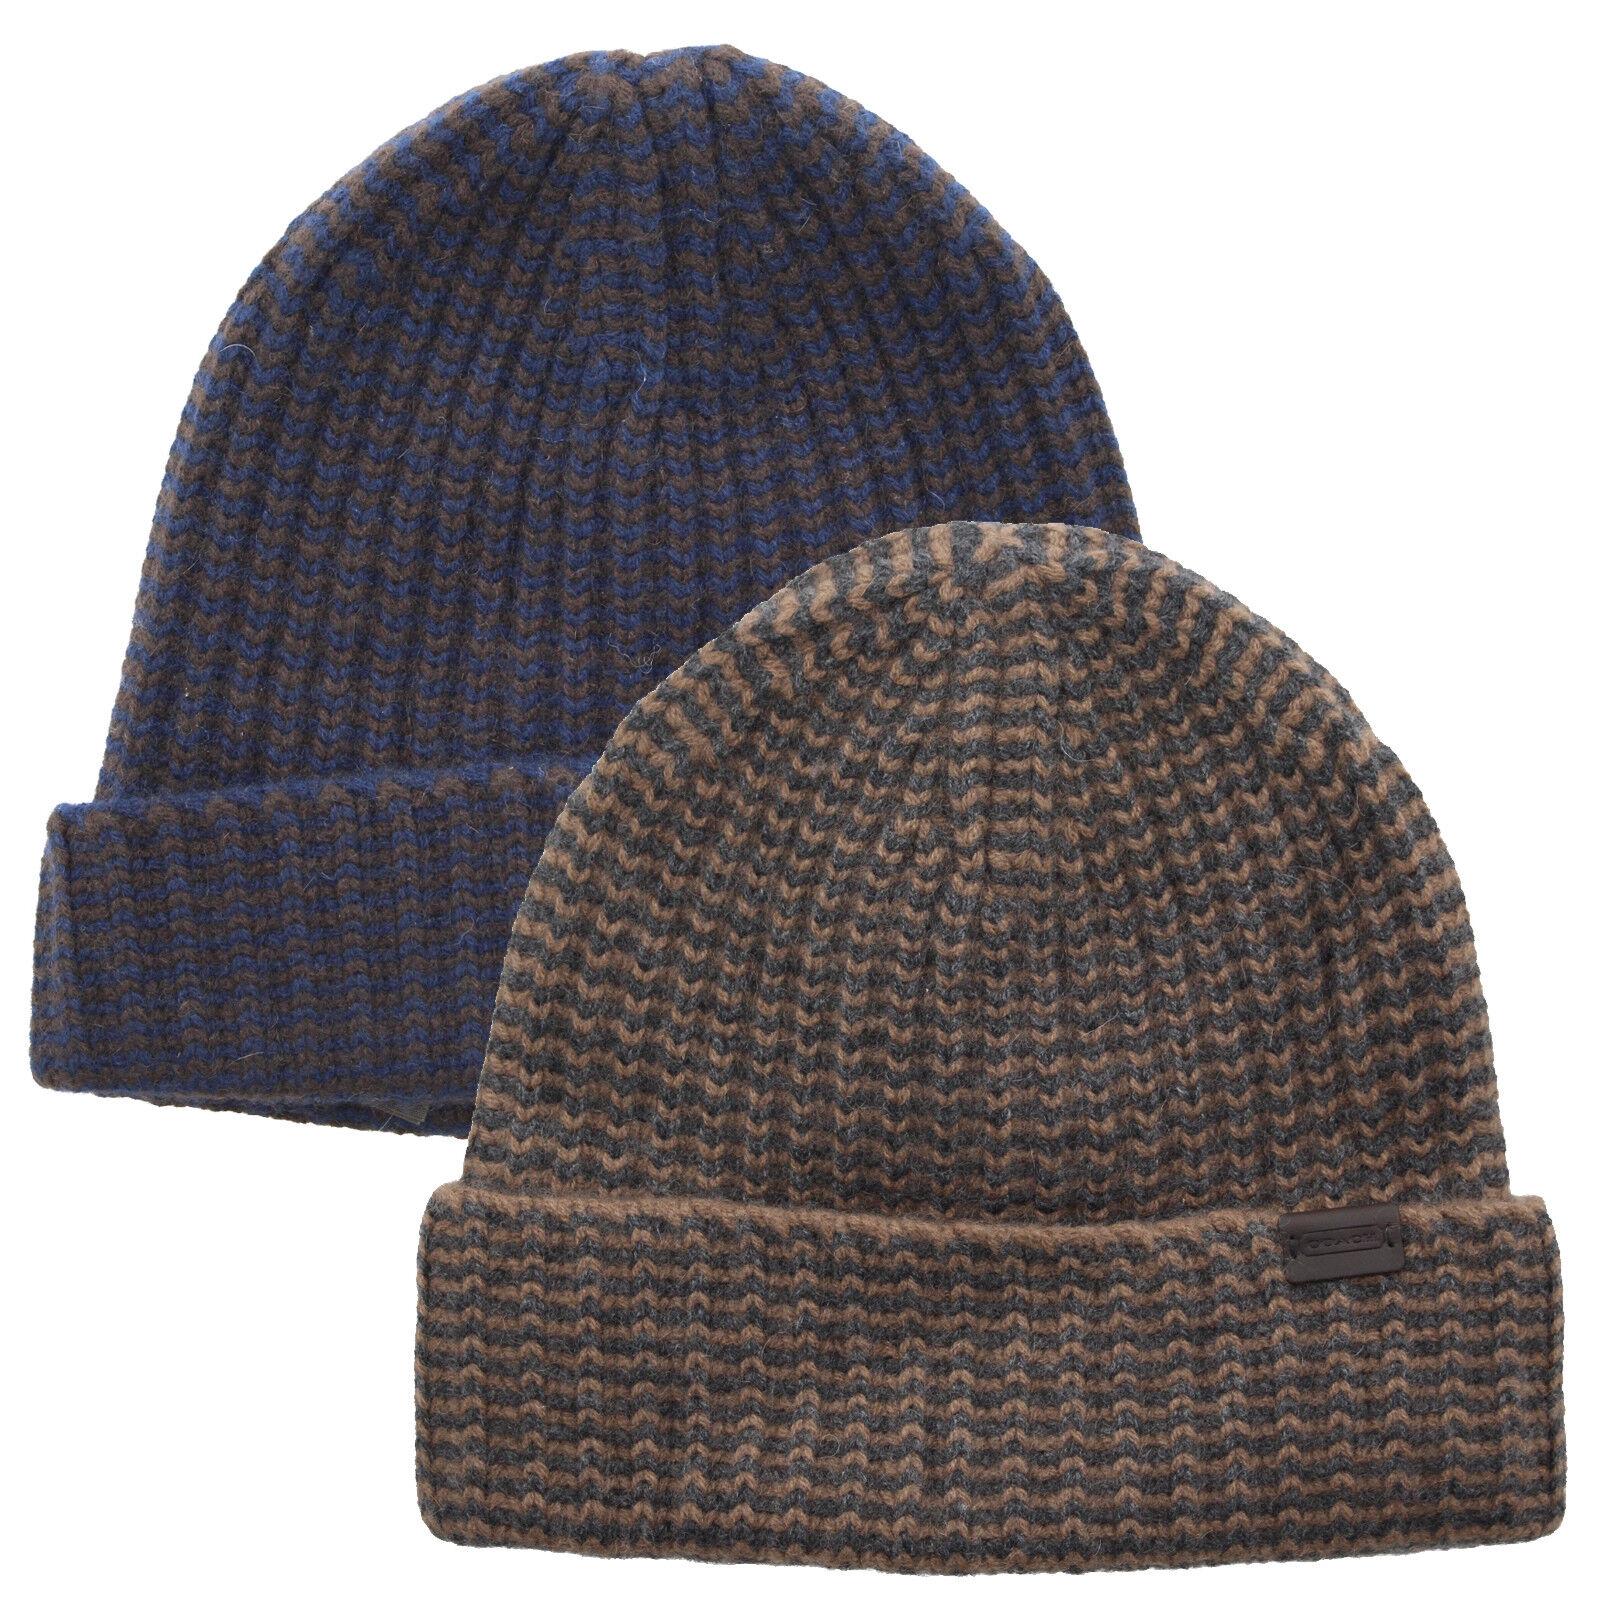 best loved 1c729 fdaa3 netherlands coach 84091 cashmere striped knit hat beanie navy blue tan gray  beanie hat cap 8ffa32